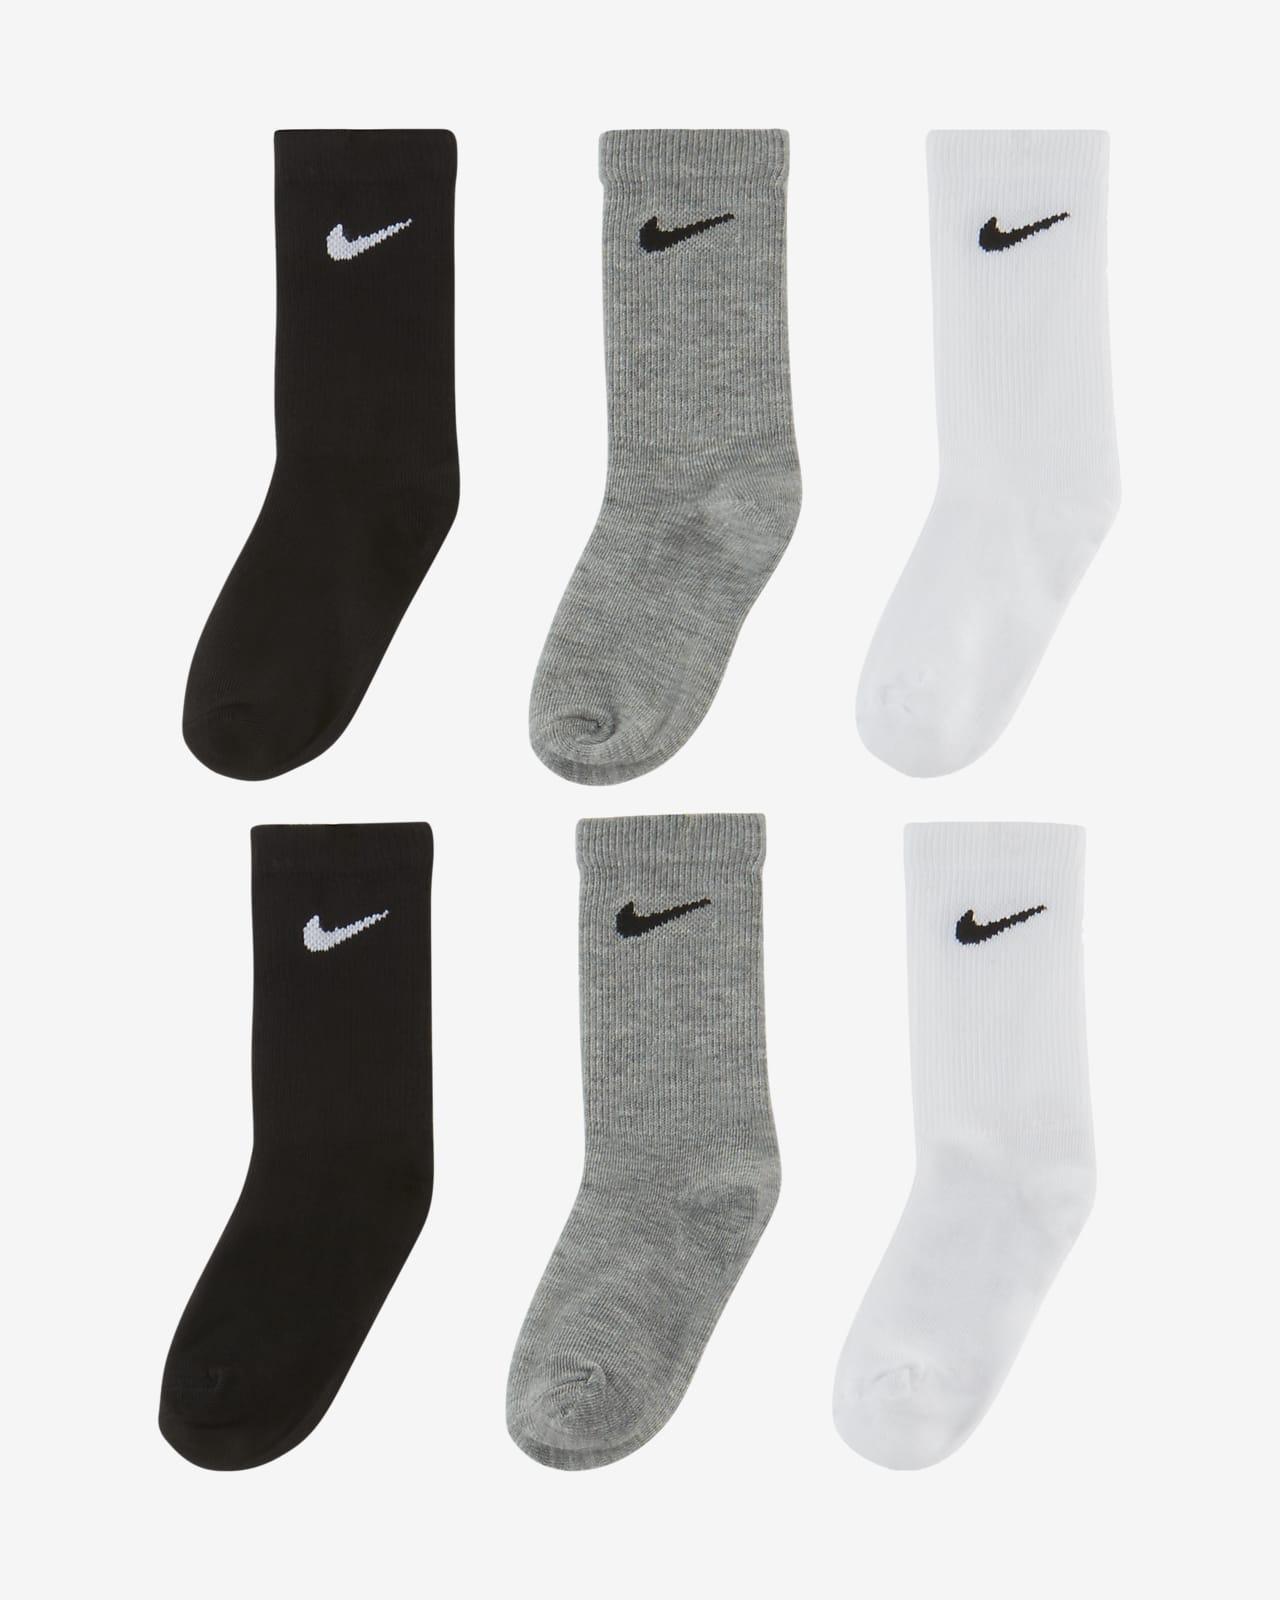 Nike Little Kids Crew Socks (6 Pairs)